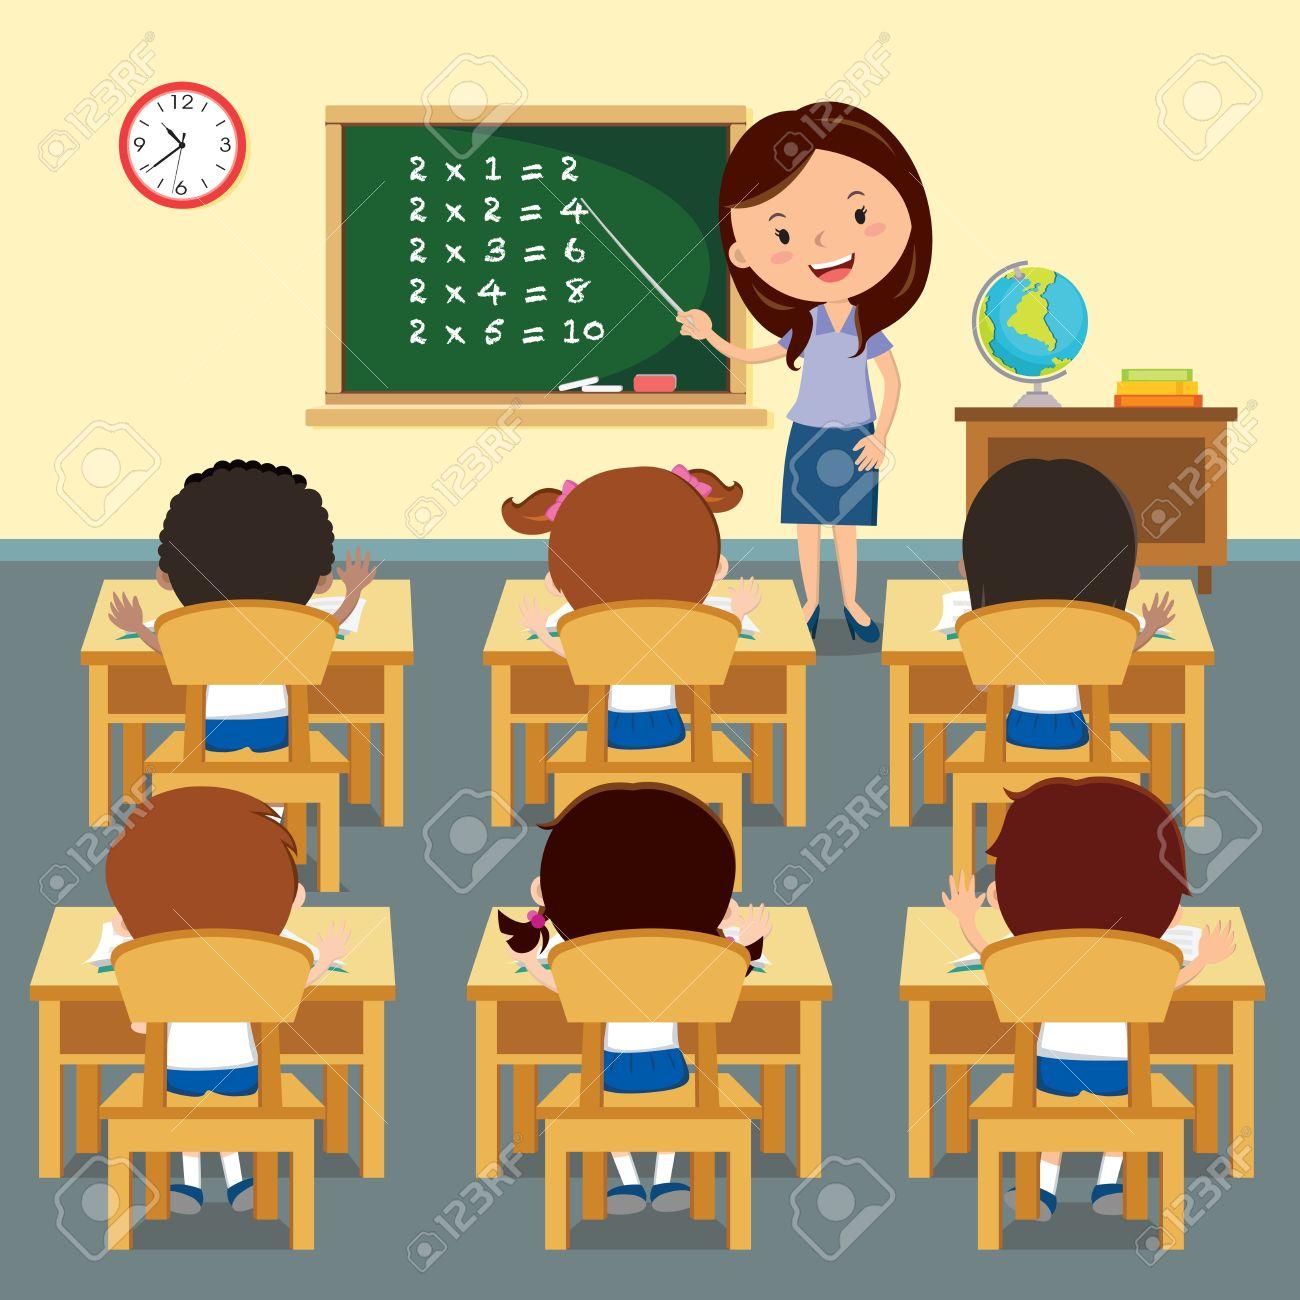 cheerful teacher teaching in classroom. illustration of a cheerful